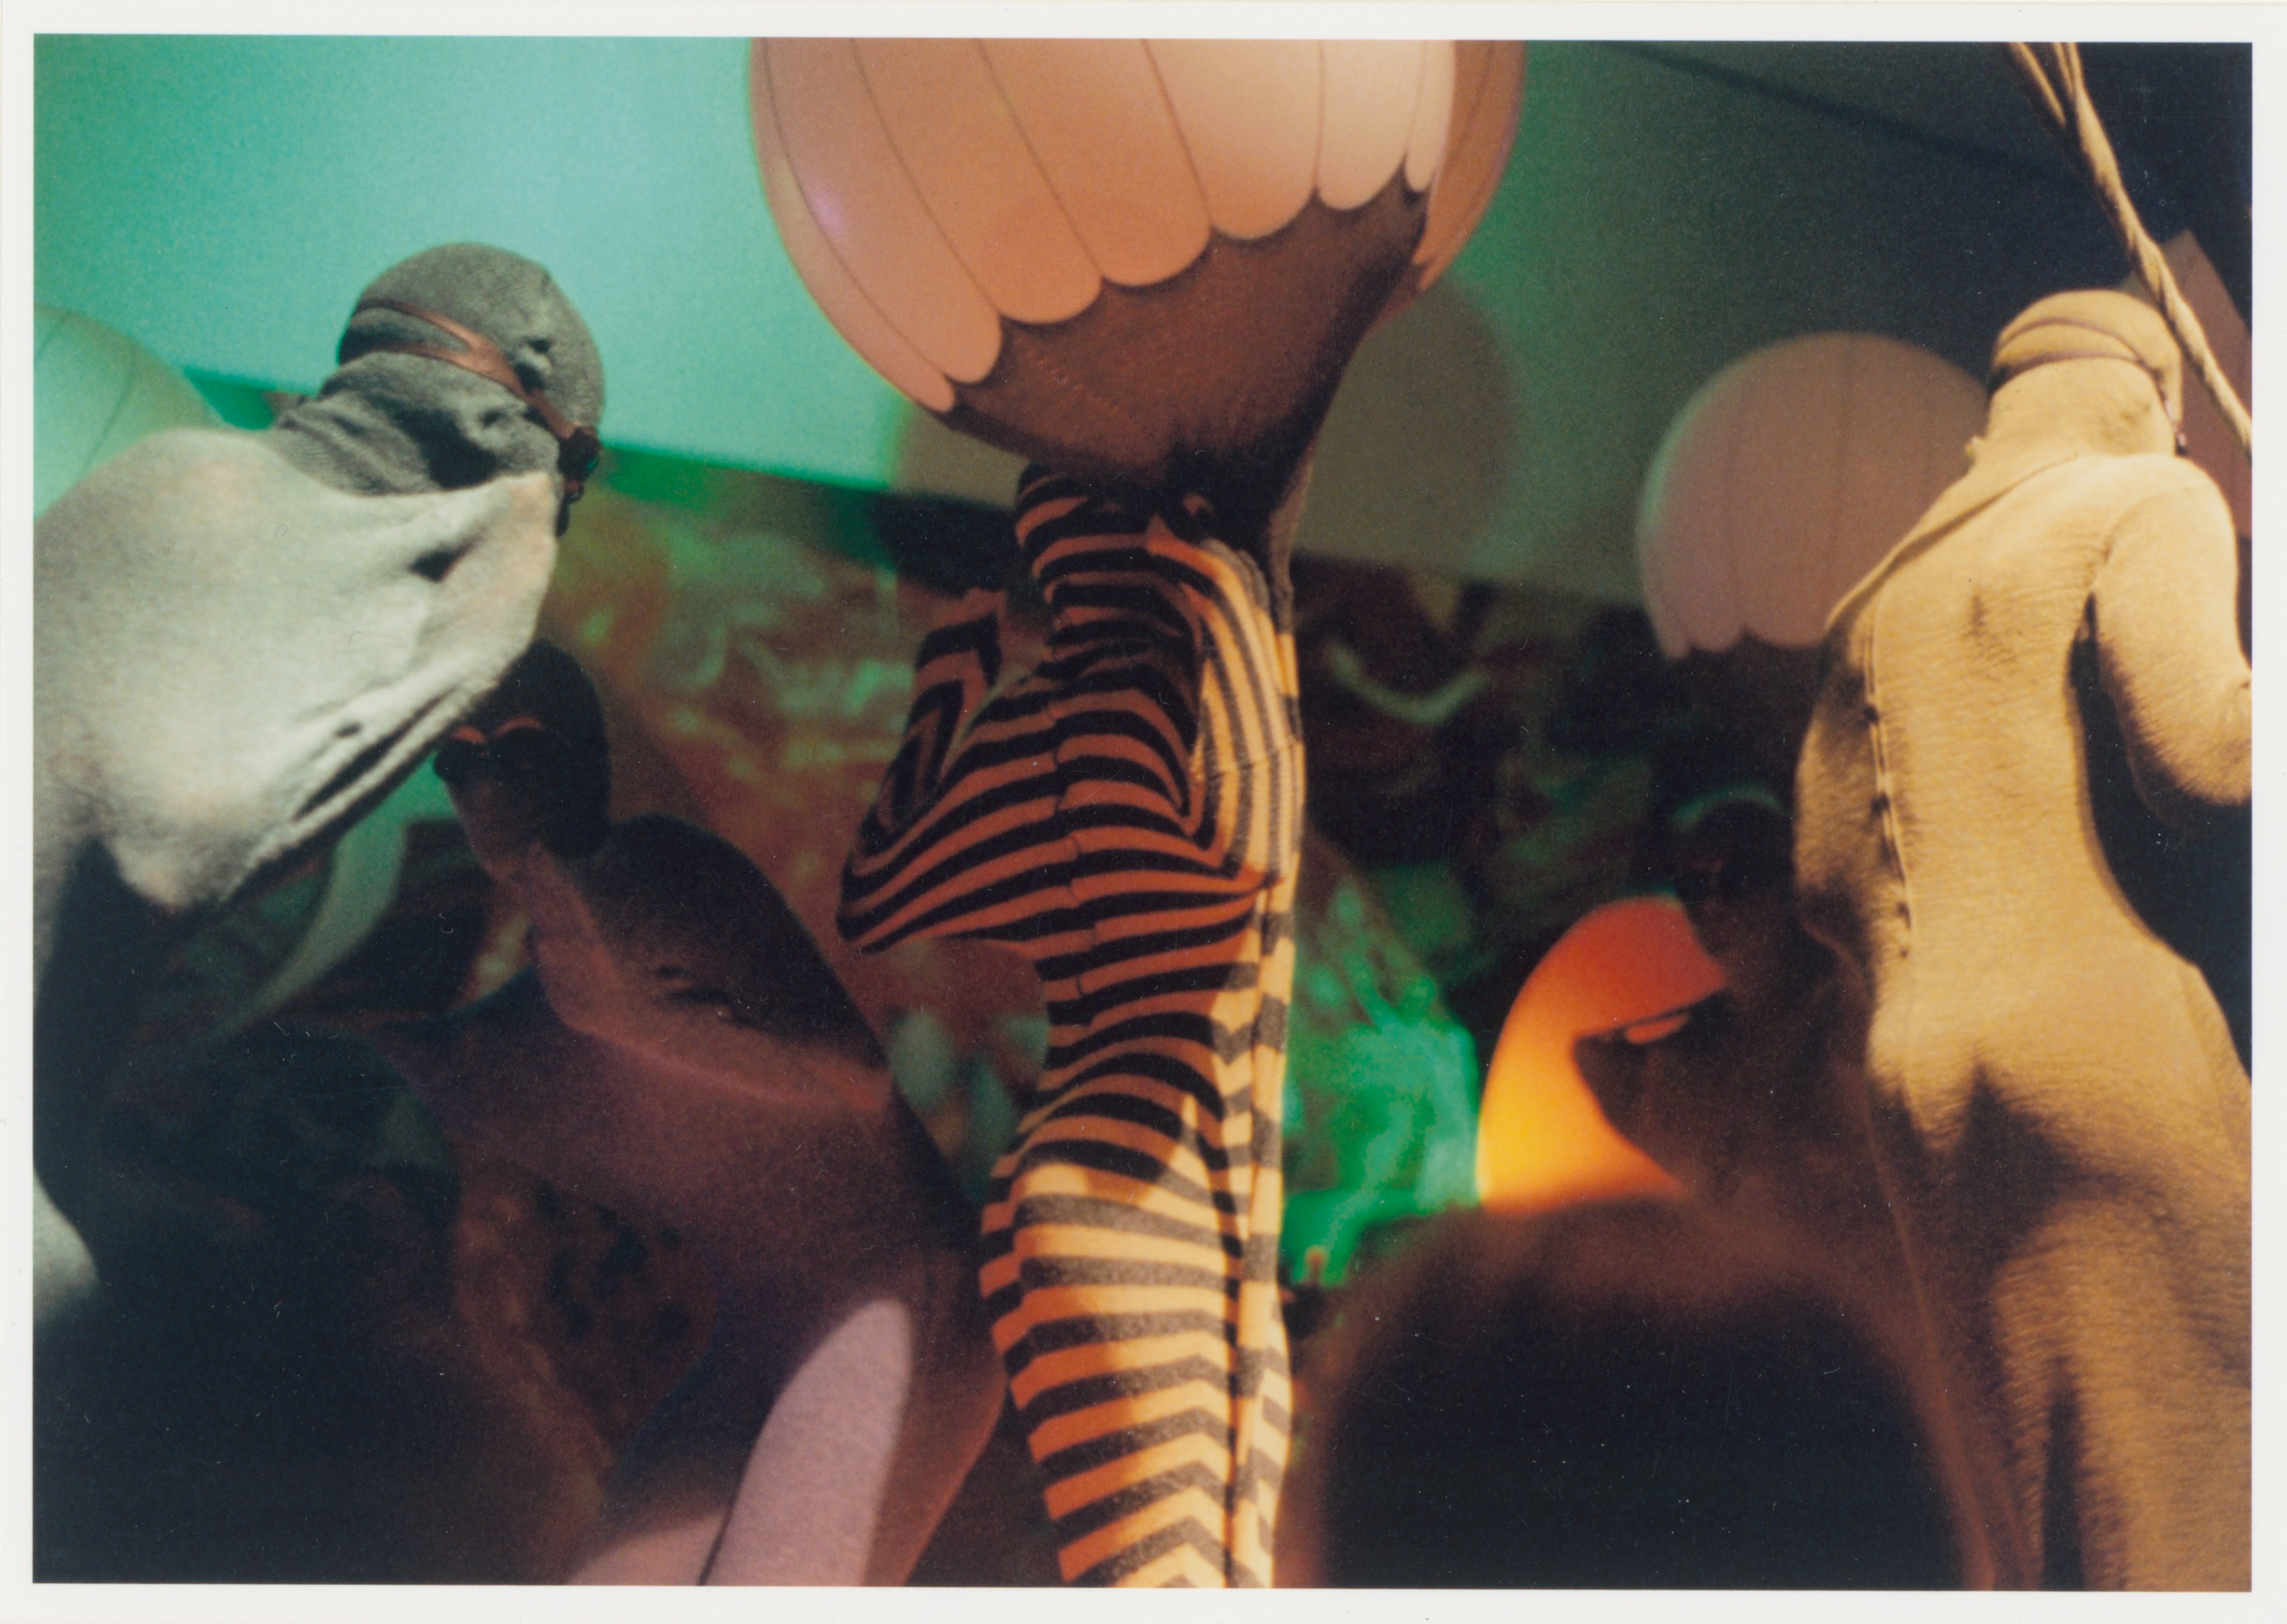 Gertrude Goroncy, Untitled (Deep Dive for the Whales, Deutsche Guggenheim), C-Print, 1997, © Gertrude Goroncy